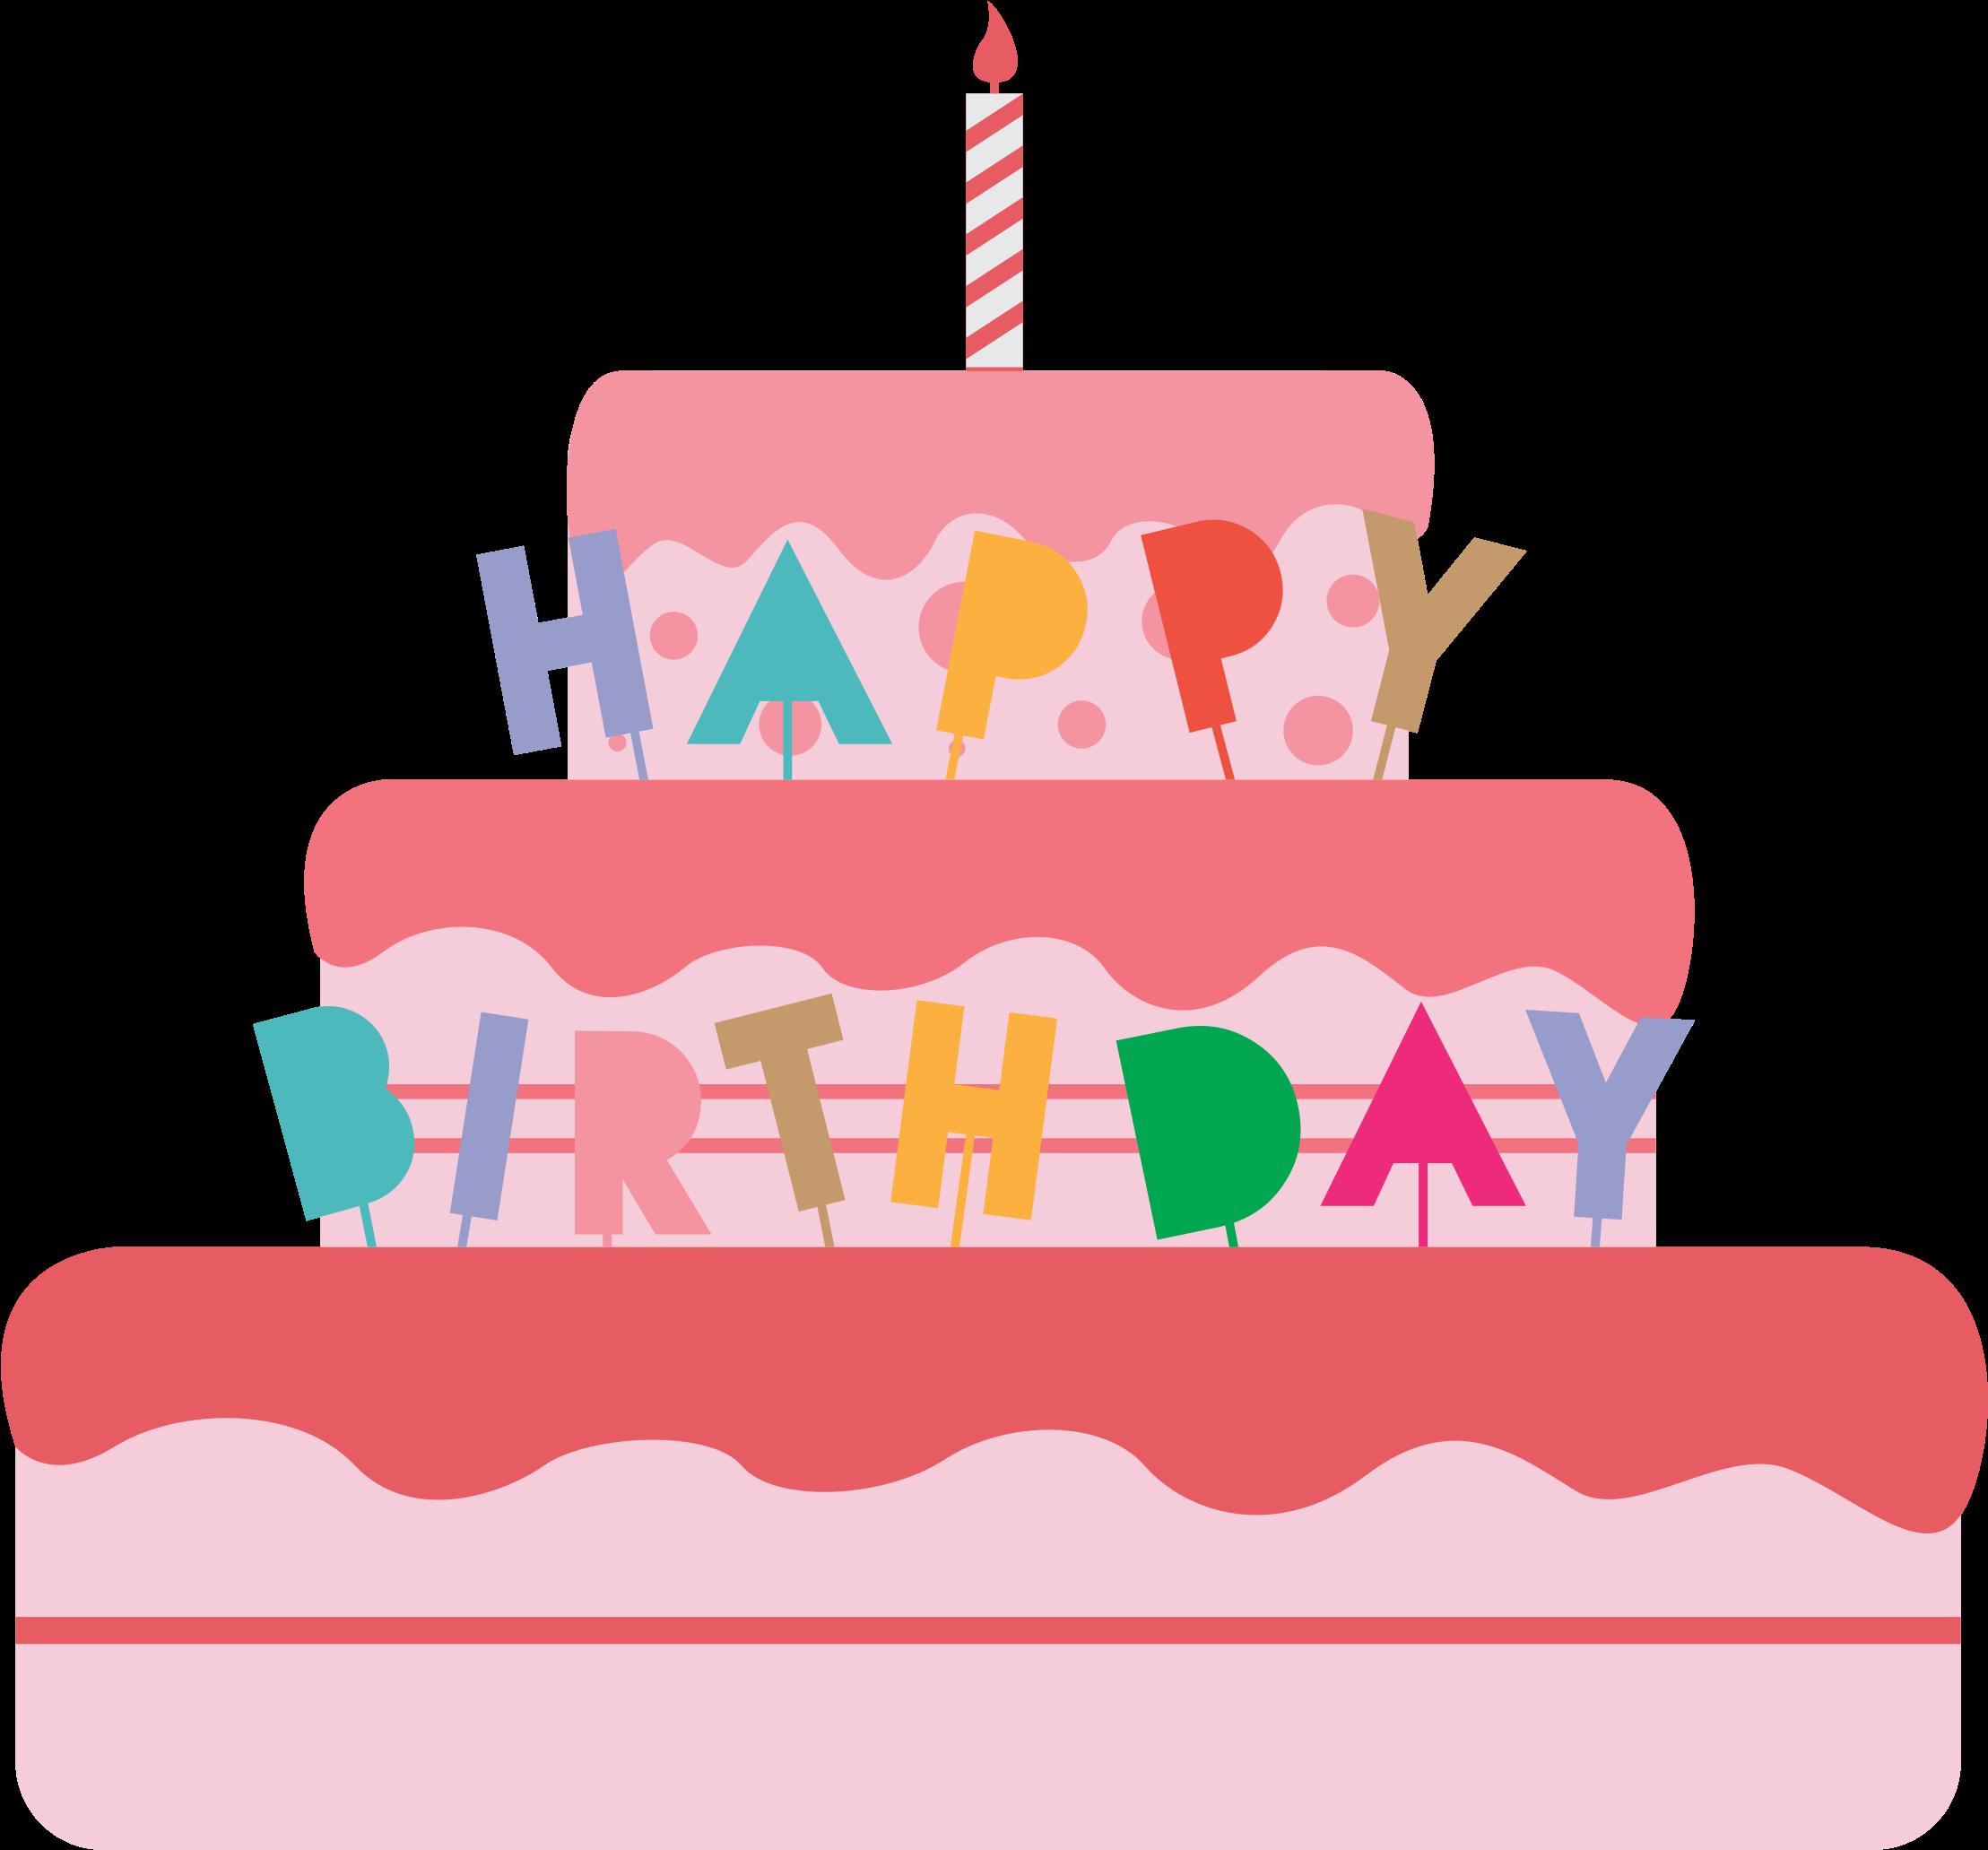 Sensational Big Image Birthday Cake Vector Png Clipart Full Size Clipart Funny Birthday Cards Online Inifodamsfinfo